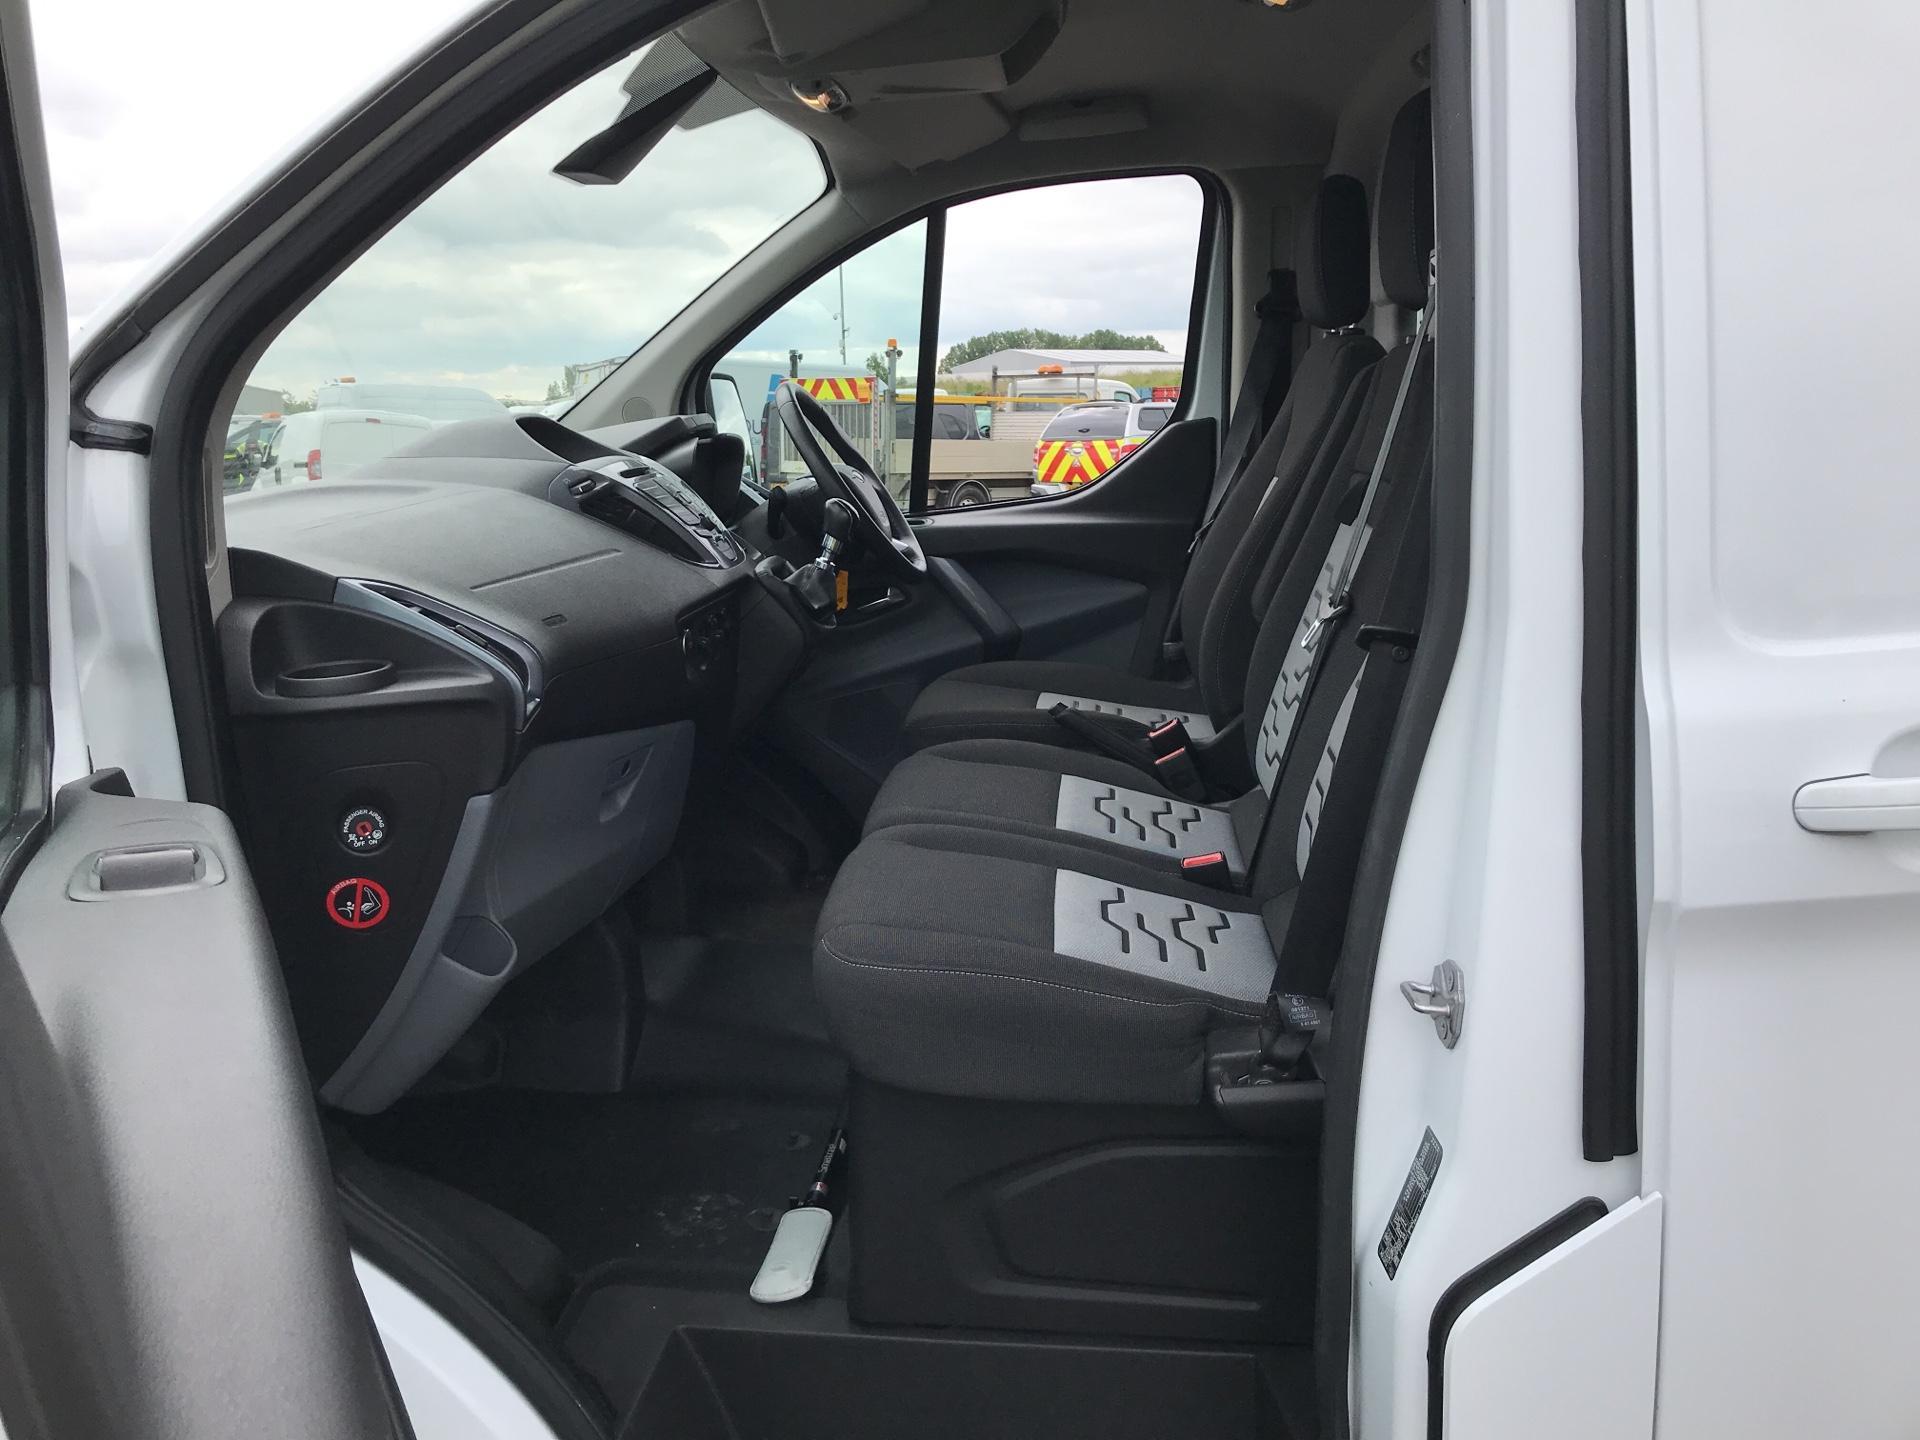 2016 Ford Transit Custom 290 L1 DIESEL FWD 2.2 TDCI 125 PS LOW ROOF LIMITED VAN EURO 5 (MK16WXV) Image 14